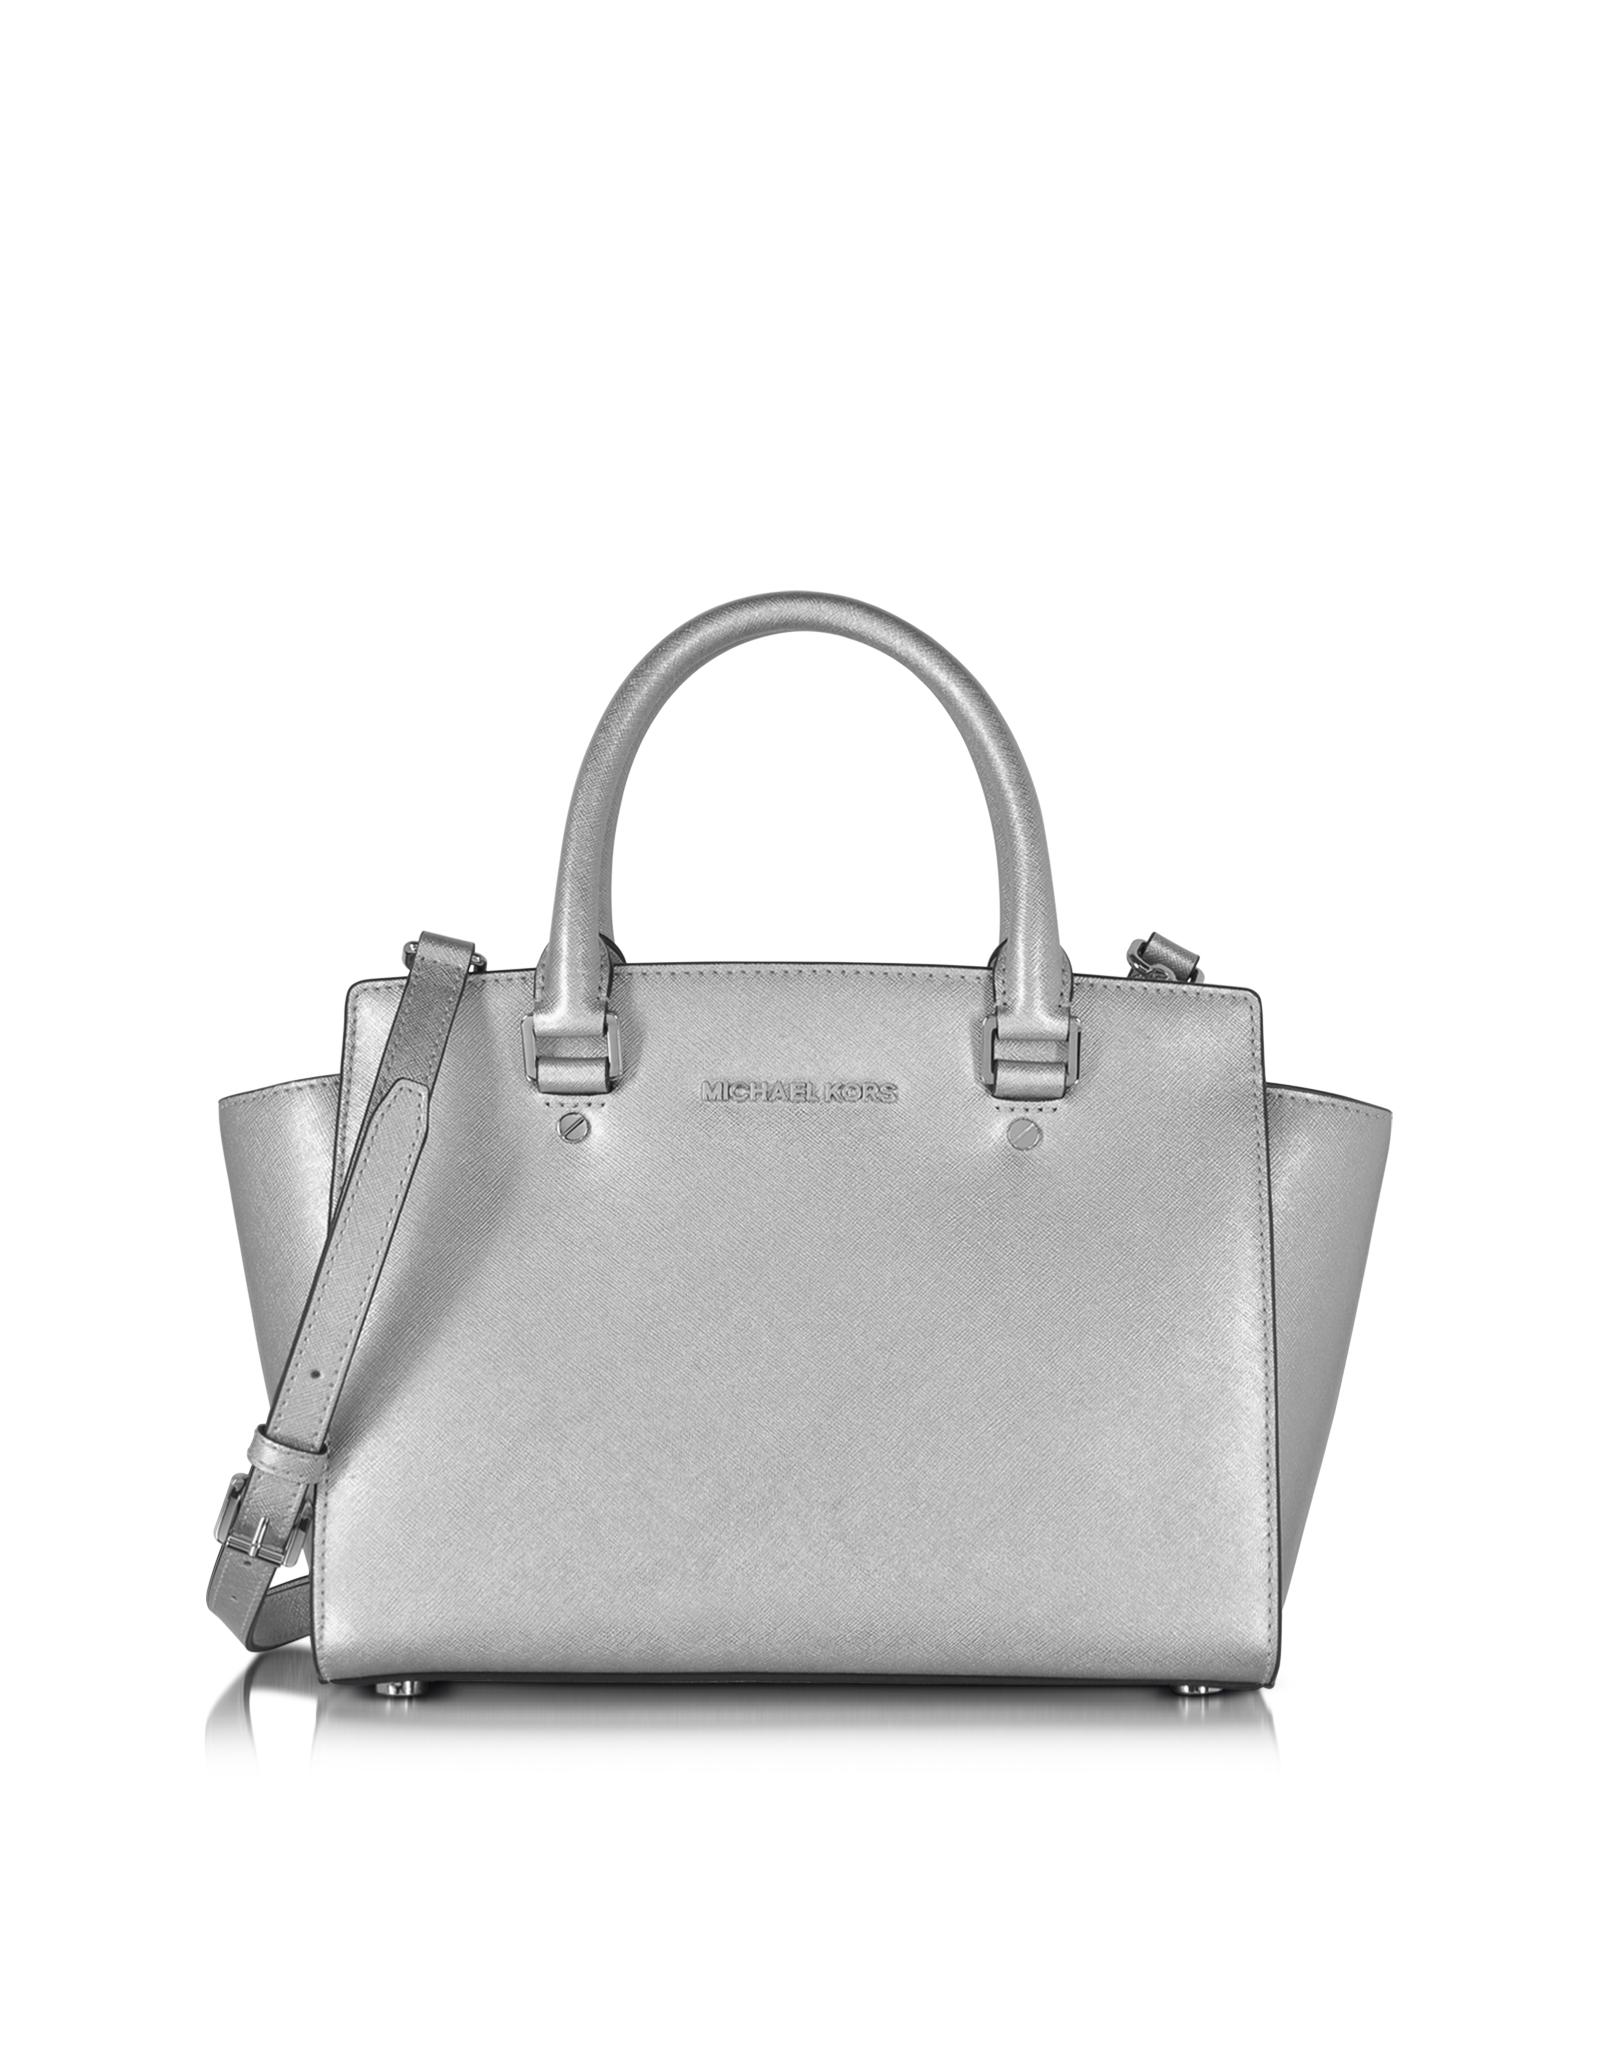 bccb270bca6a1f Michael Kors Selma Saffiano Leather Medium Satchel Bag in Metallic ...